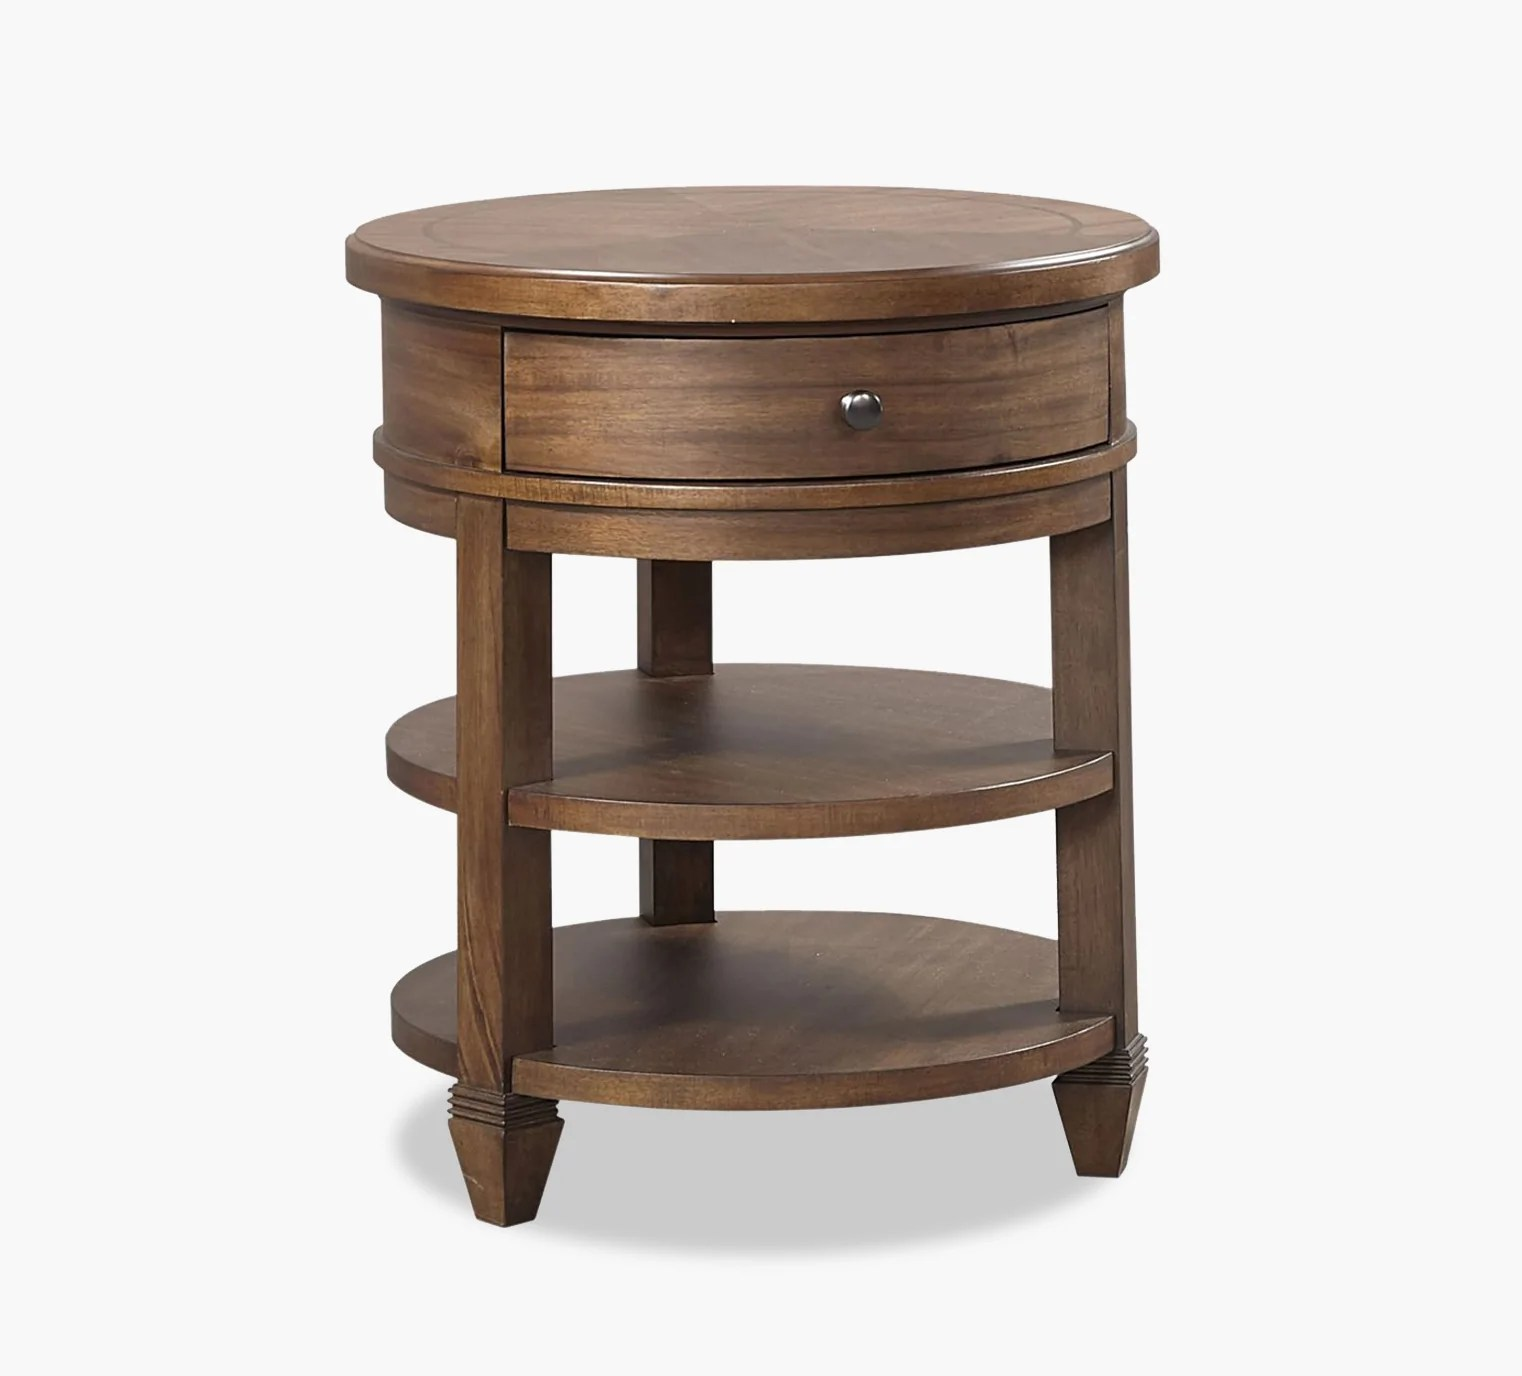 Thornton Round Nightstand